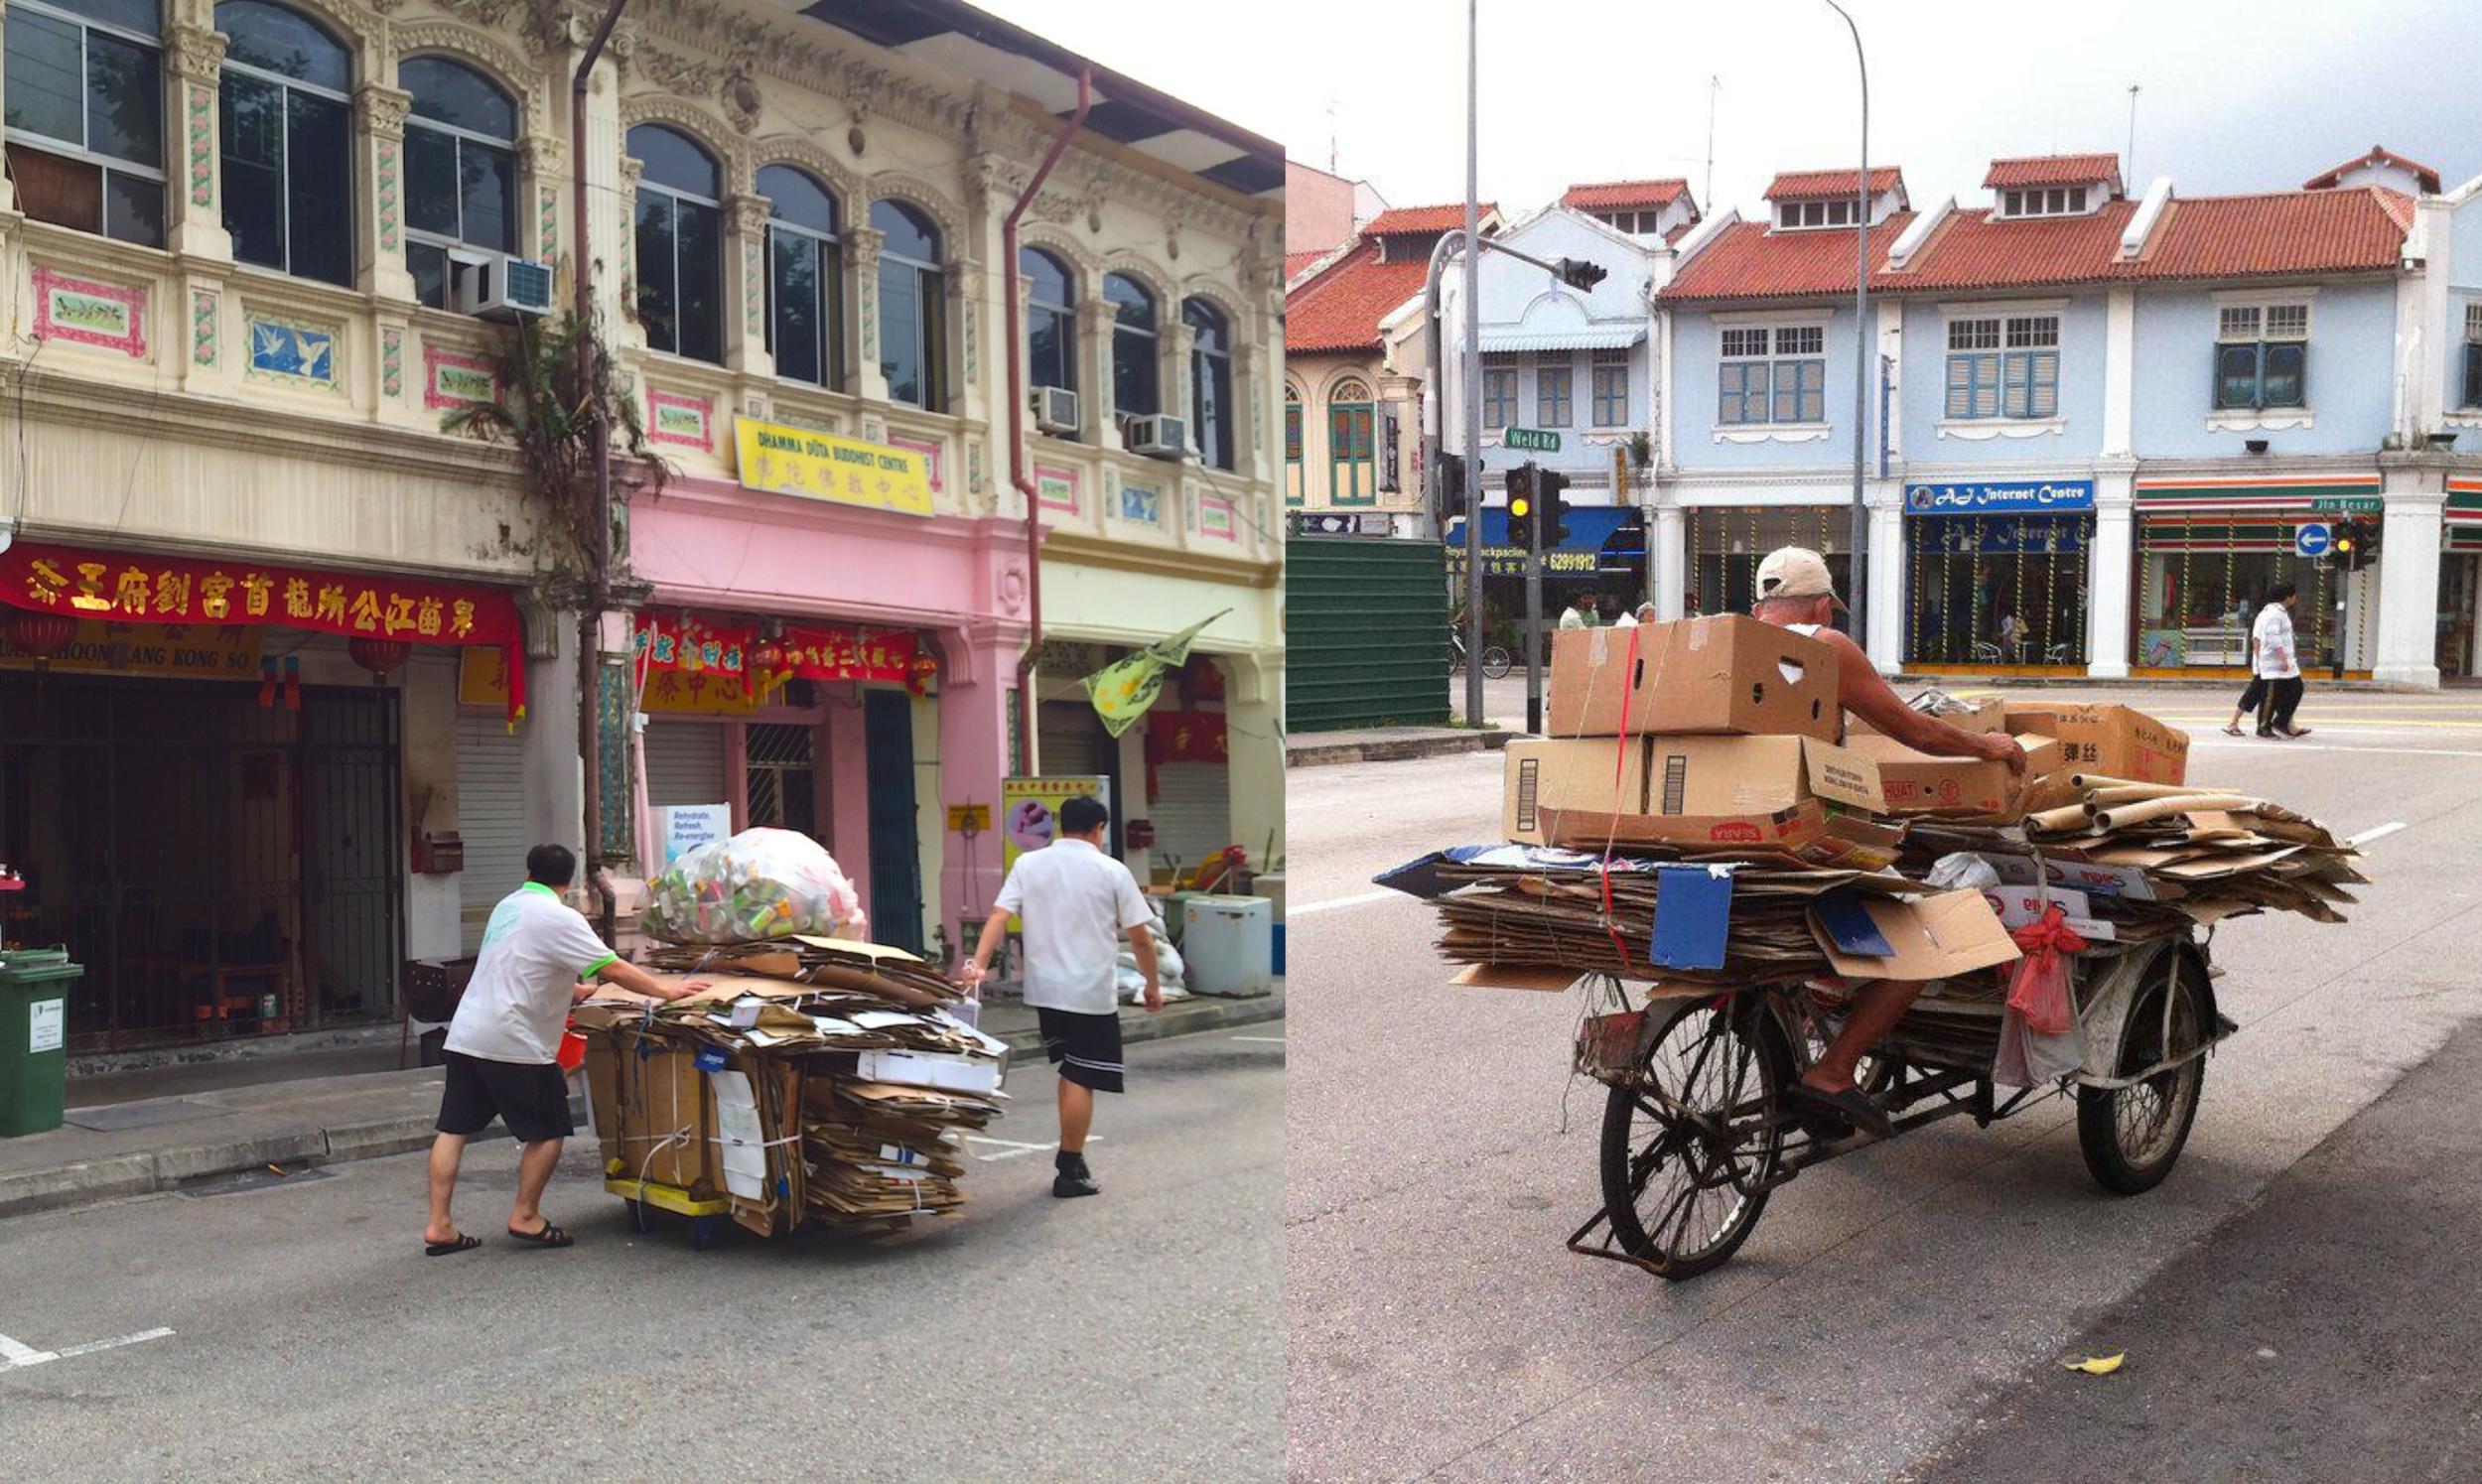 Karung Guni  folks on their rounds in neighborhoods in Singapore